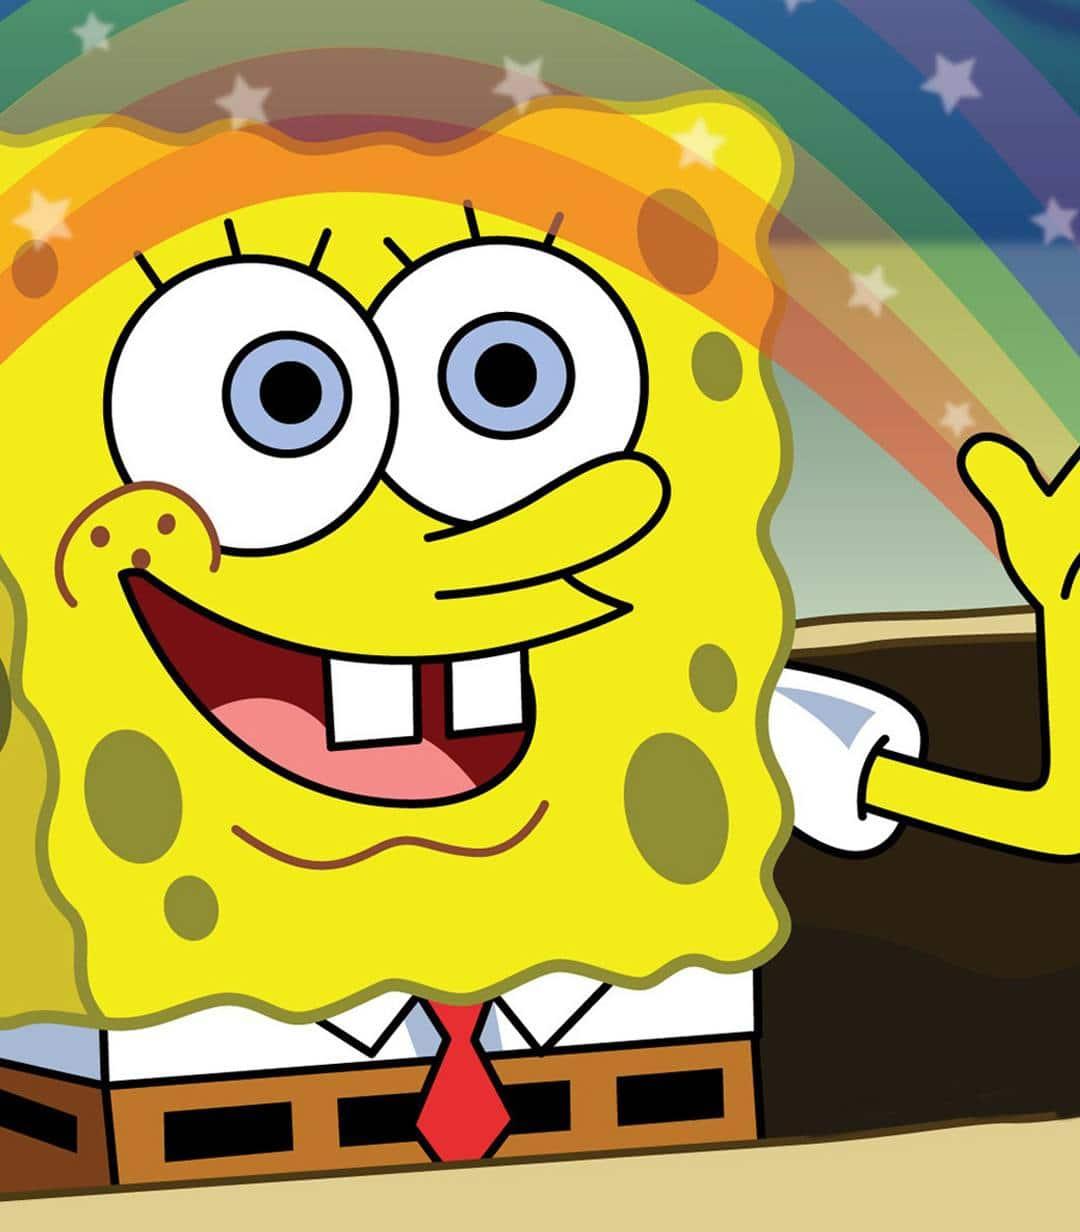 программа Nickelodeon: Губка Боб Квадратные Штаны Прощай, крабсбургер?